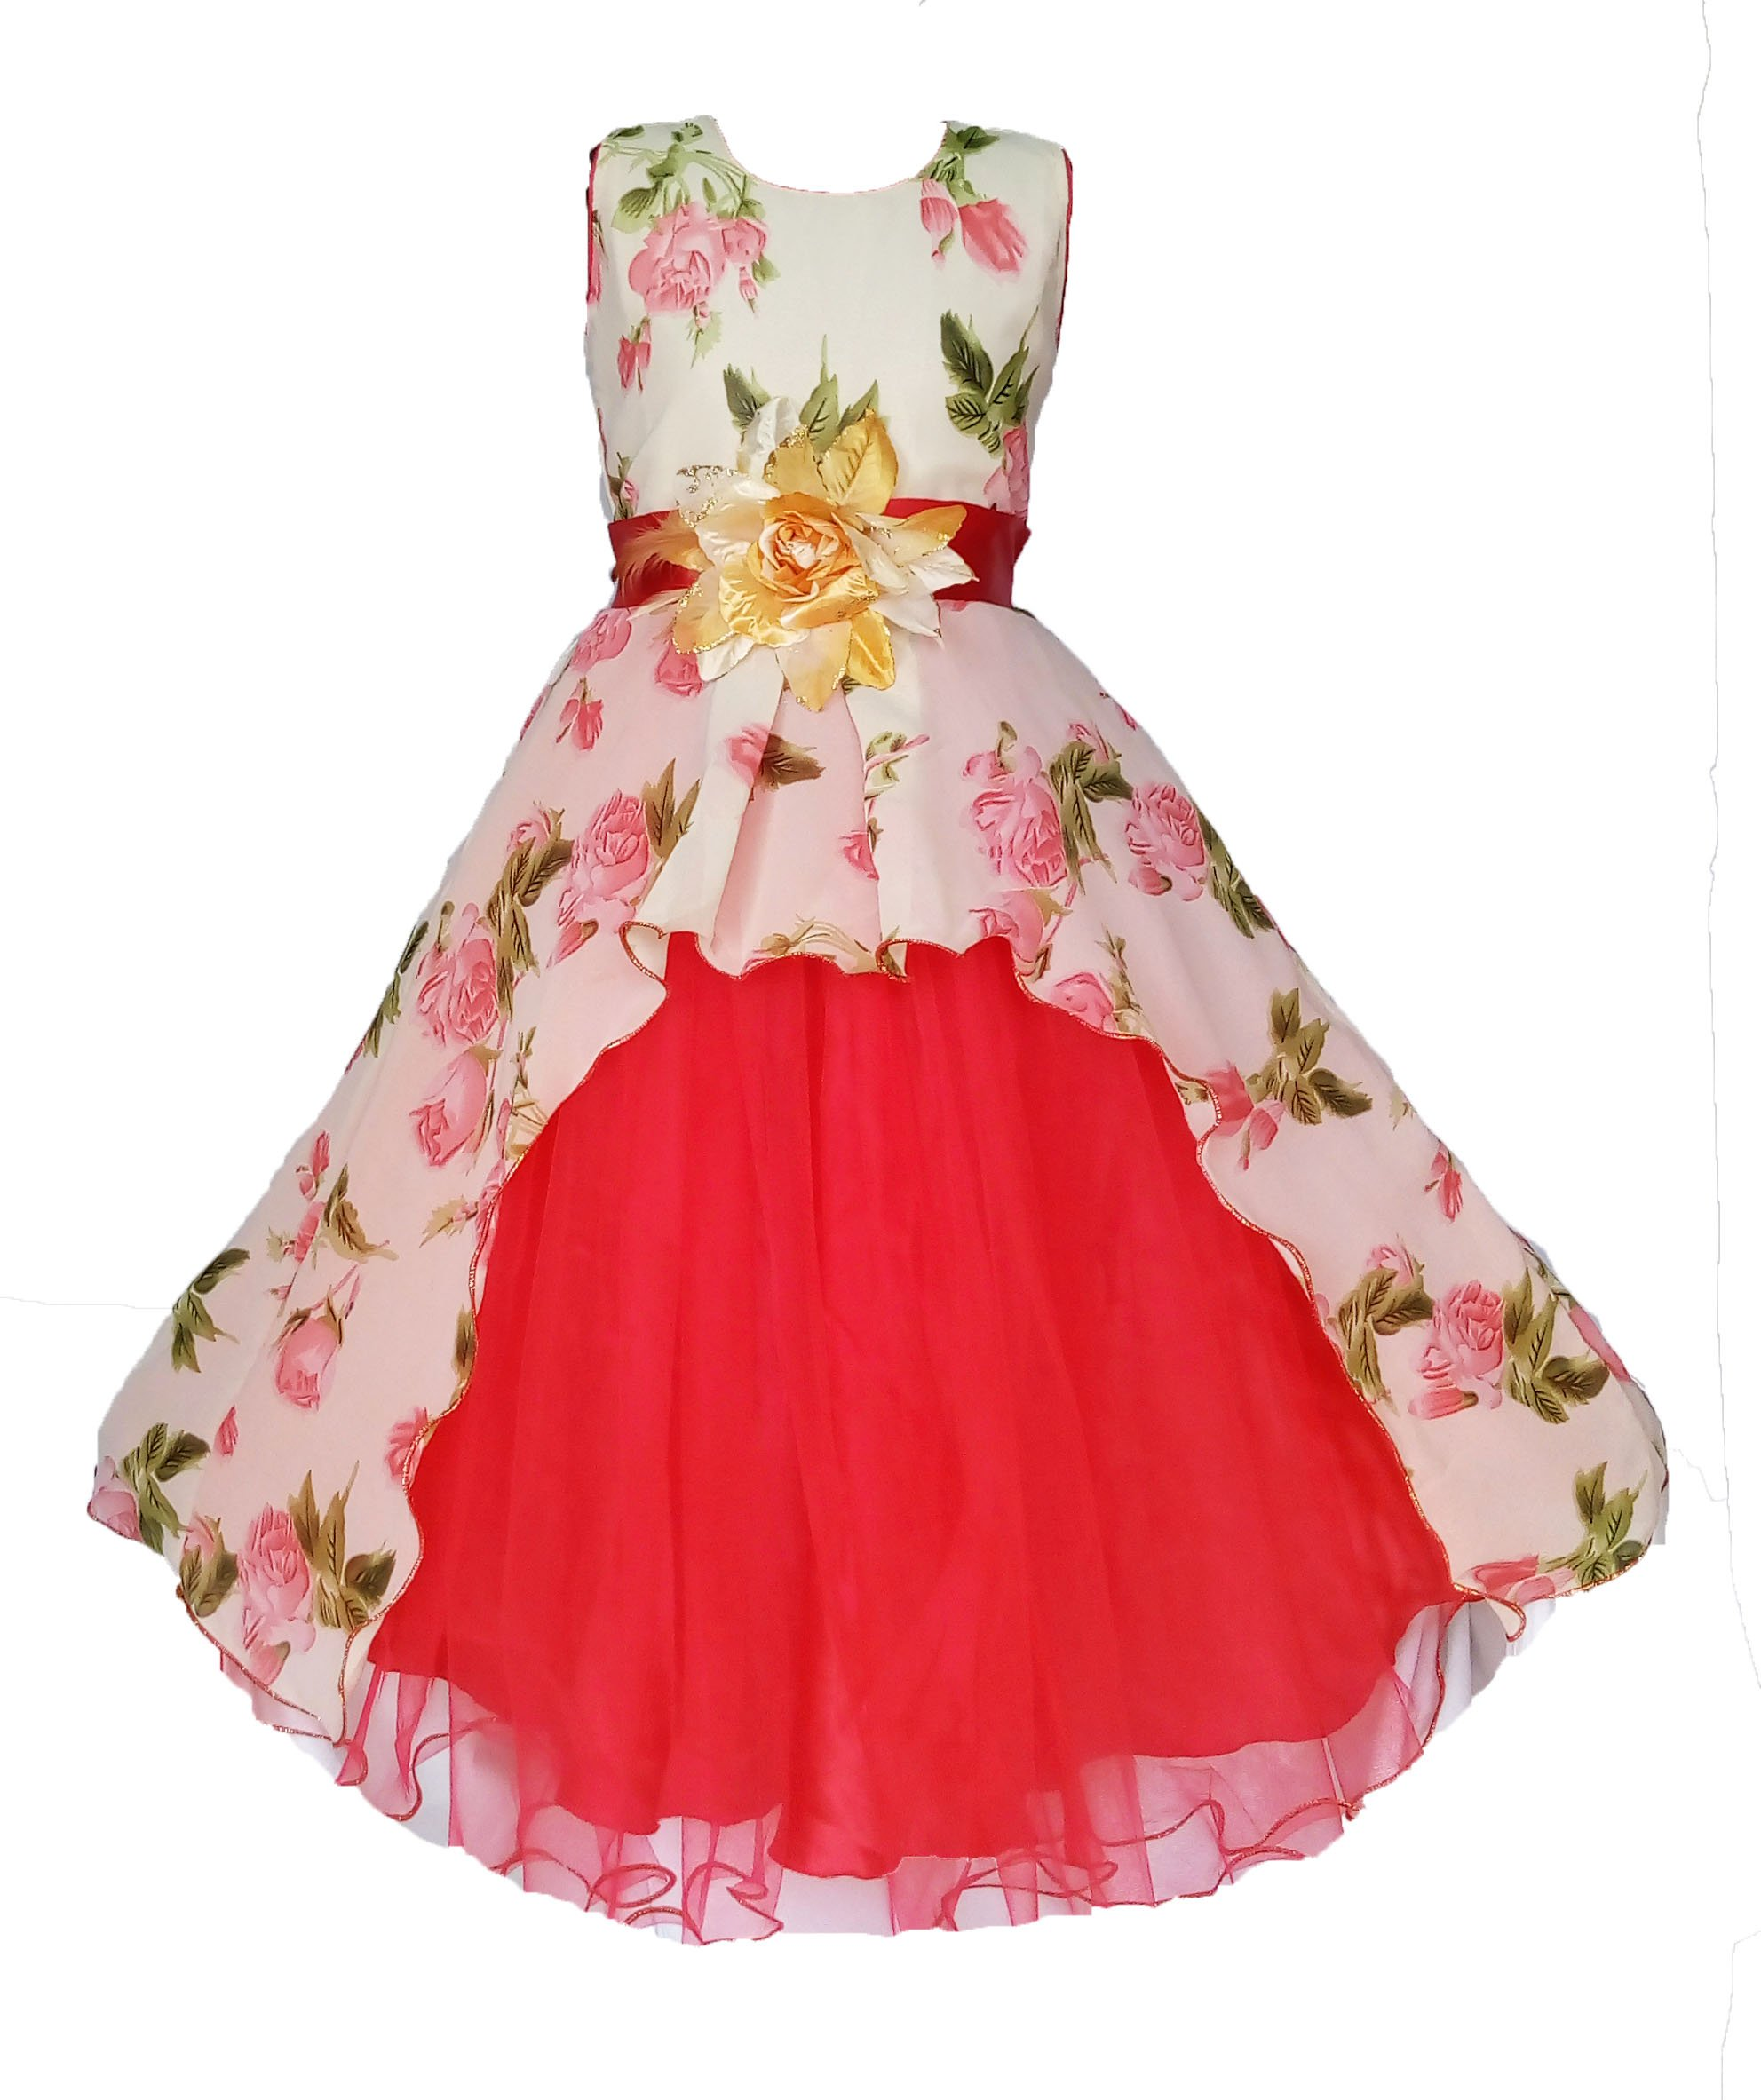 39c8ebeed My Lil Princess Baby Girls Georgette A-Line Dress (Cute Pastel 3-9 ...